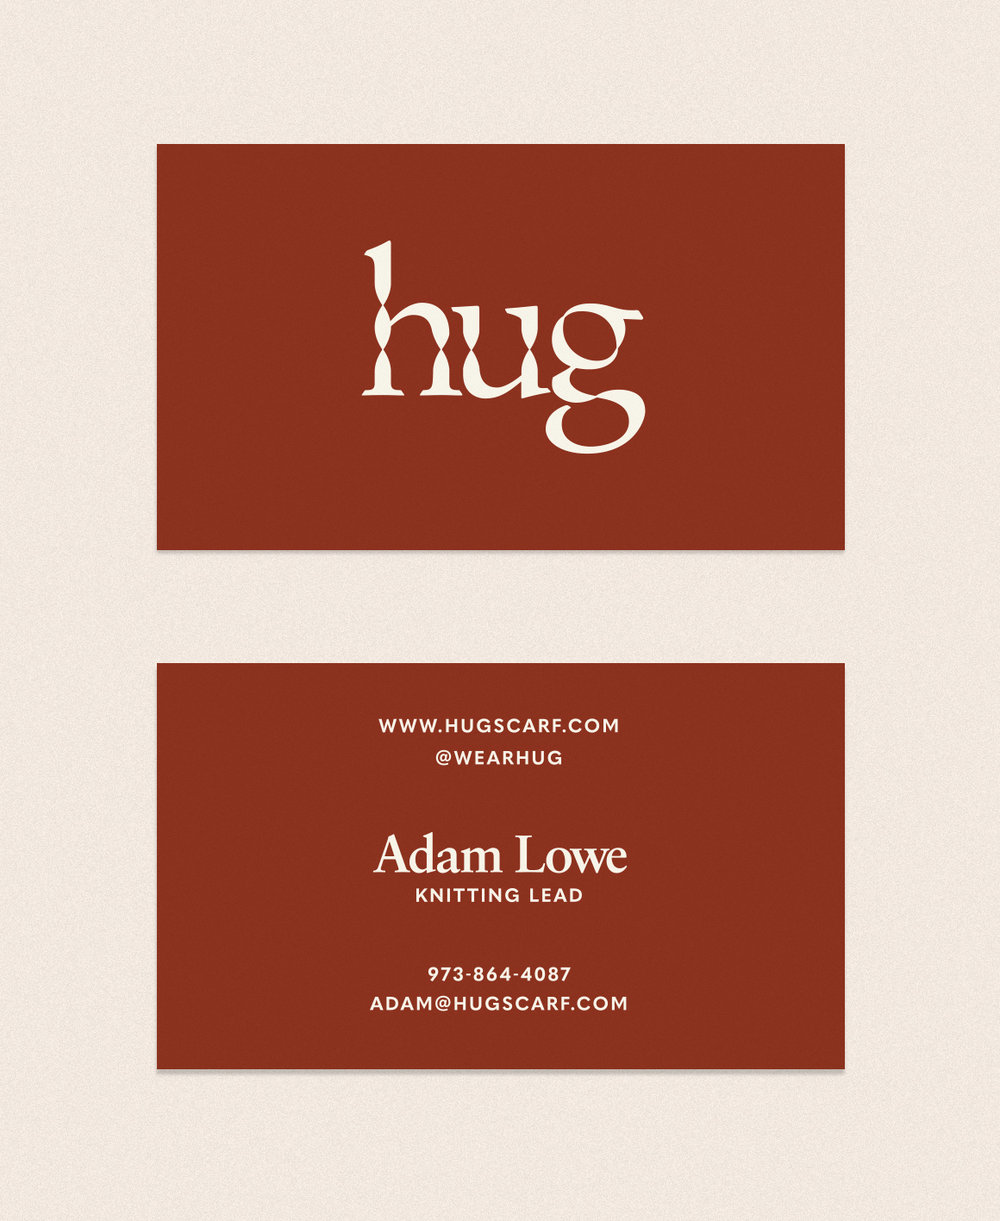 hug_BizCard_v4.jpg